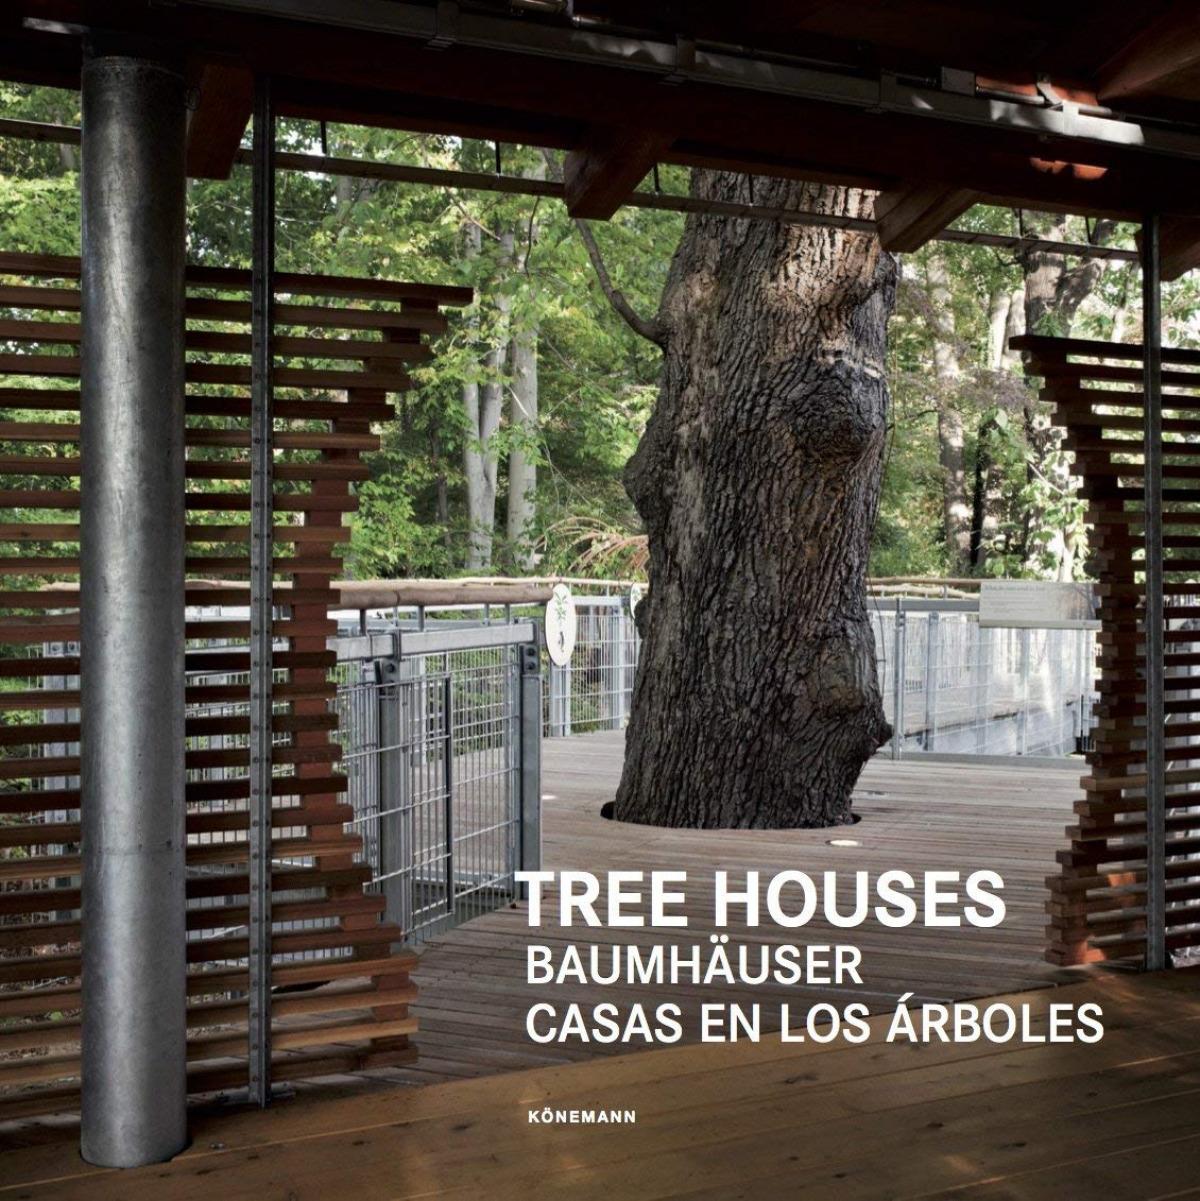 TREE HOUSES 9783741920554